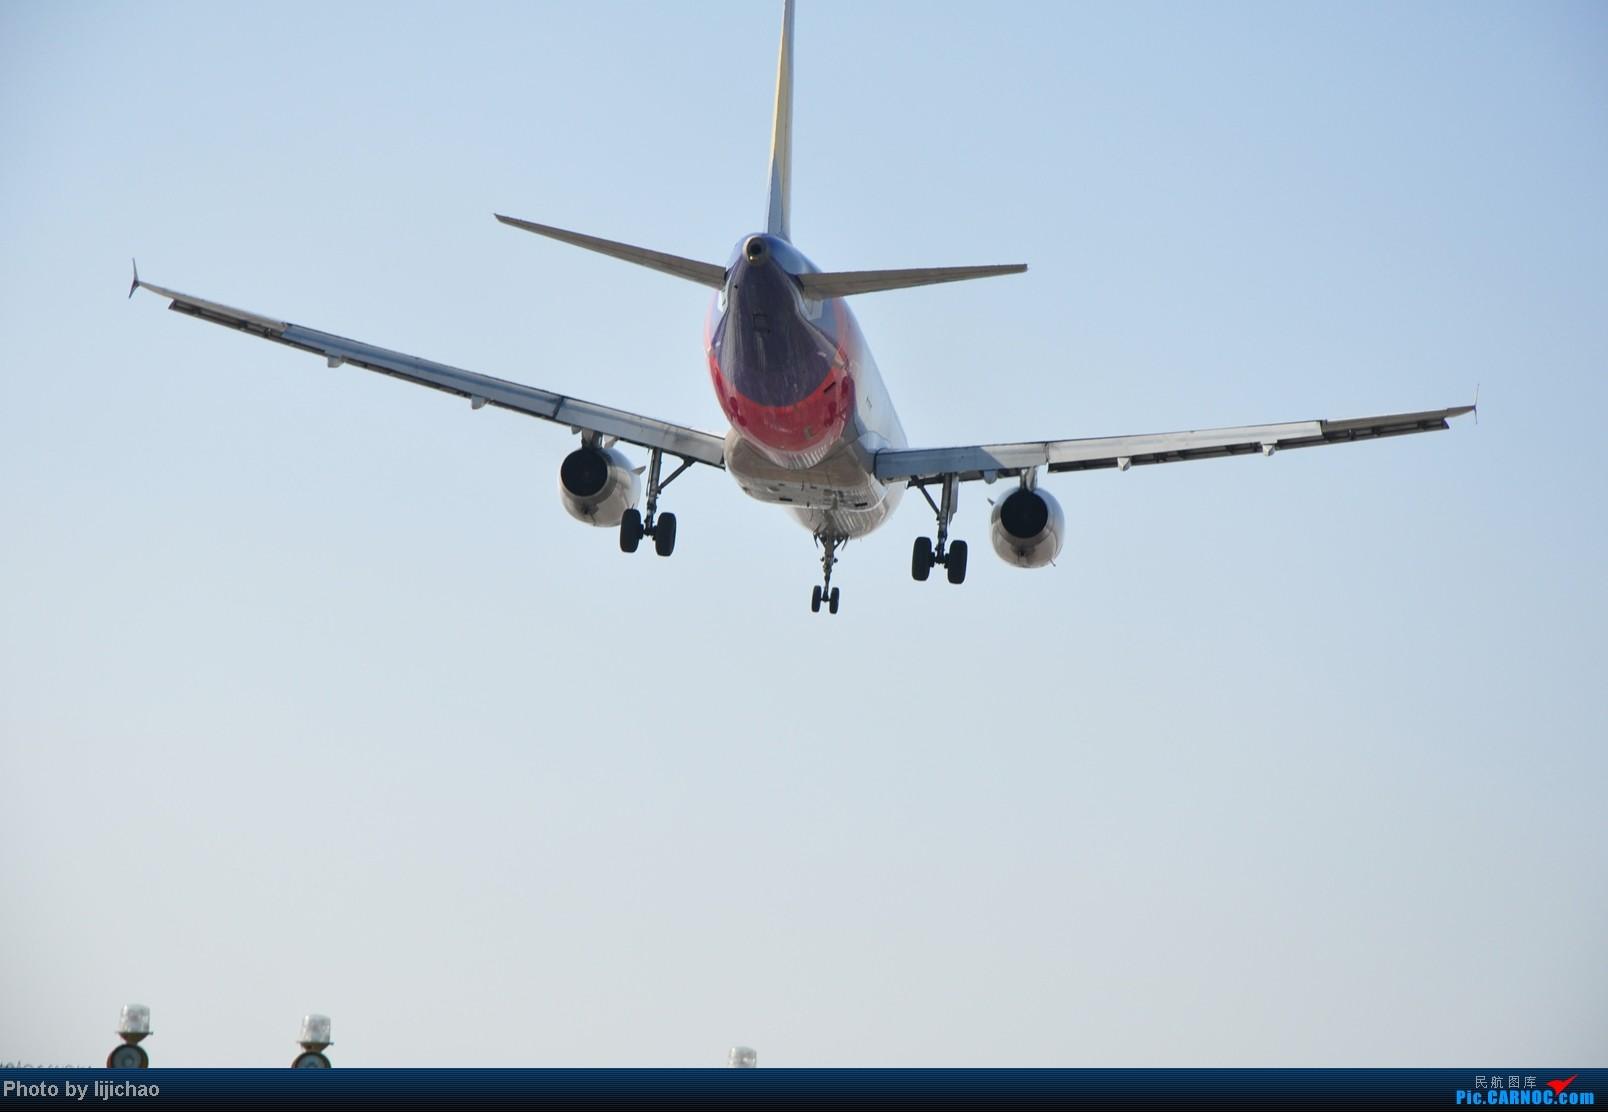 Re:[原创]沈阳桃仙机场跑道尽头随拍 AIRBUS A320 HL7776 中国沈阳桃仙机场